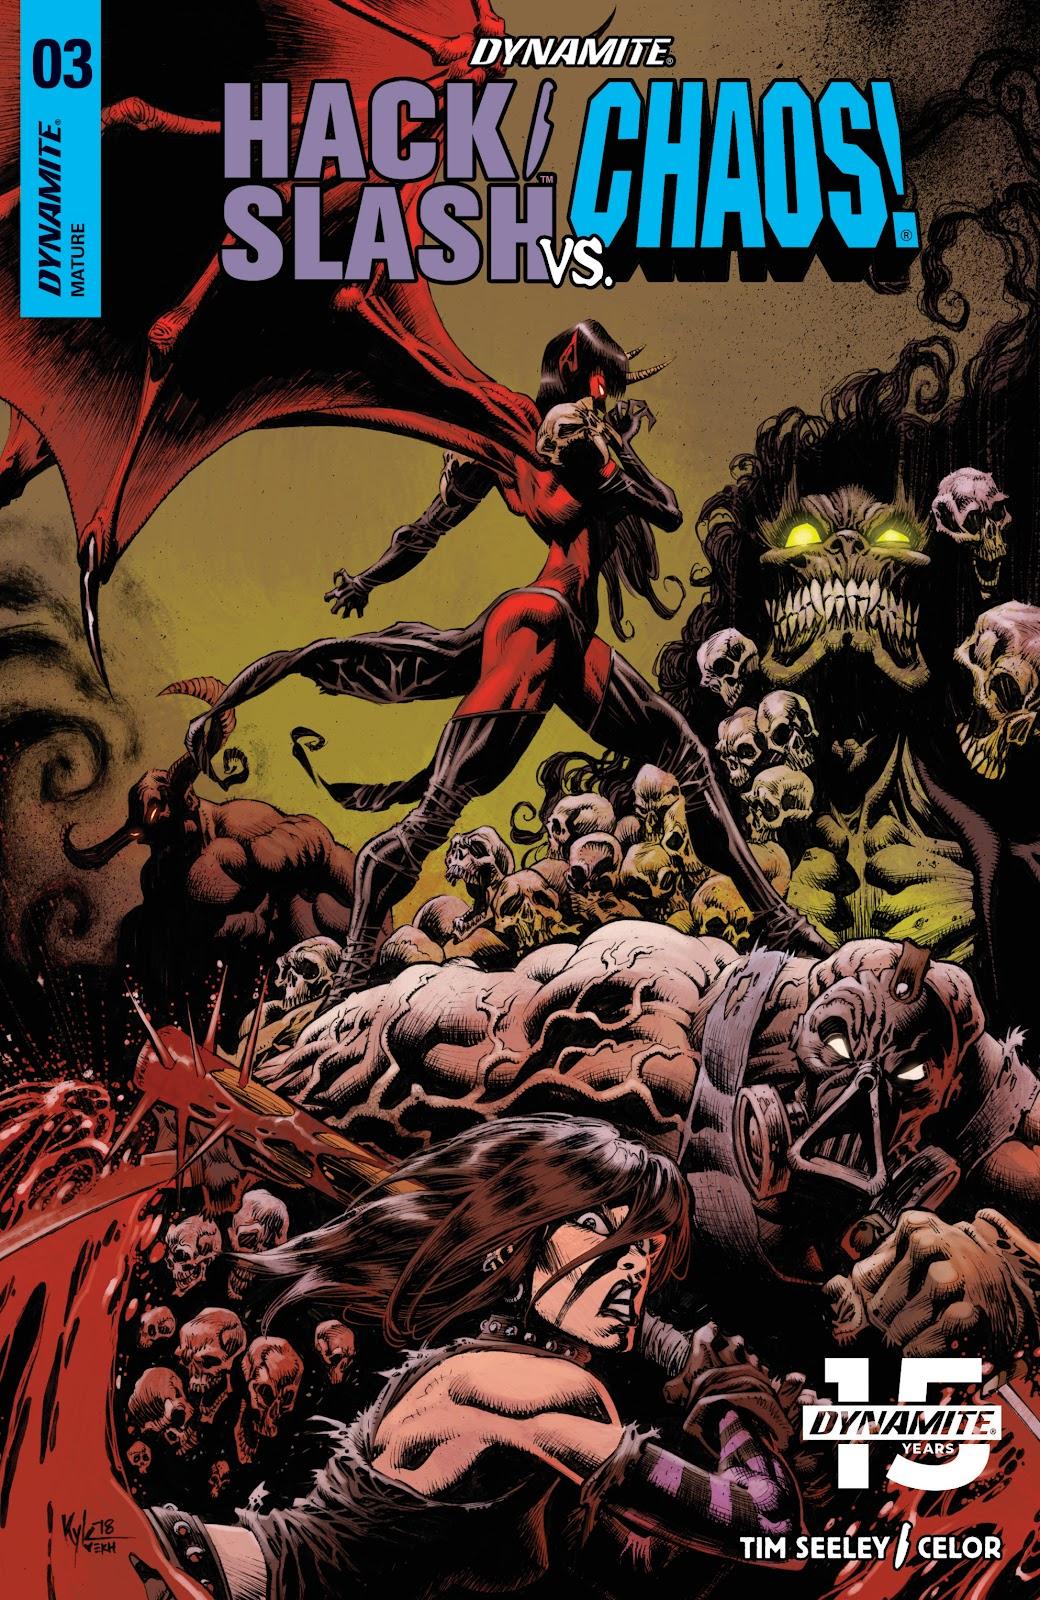 Read online Hack/Slash vs. Chaos comic -  Issue #3 - 3